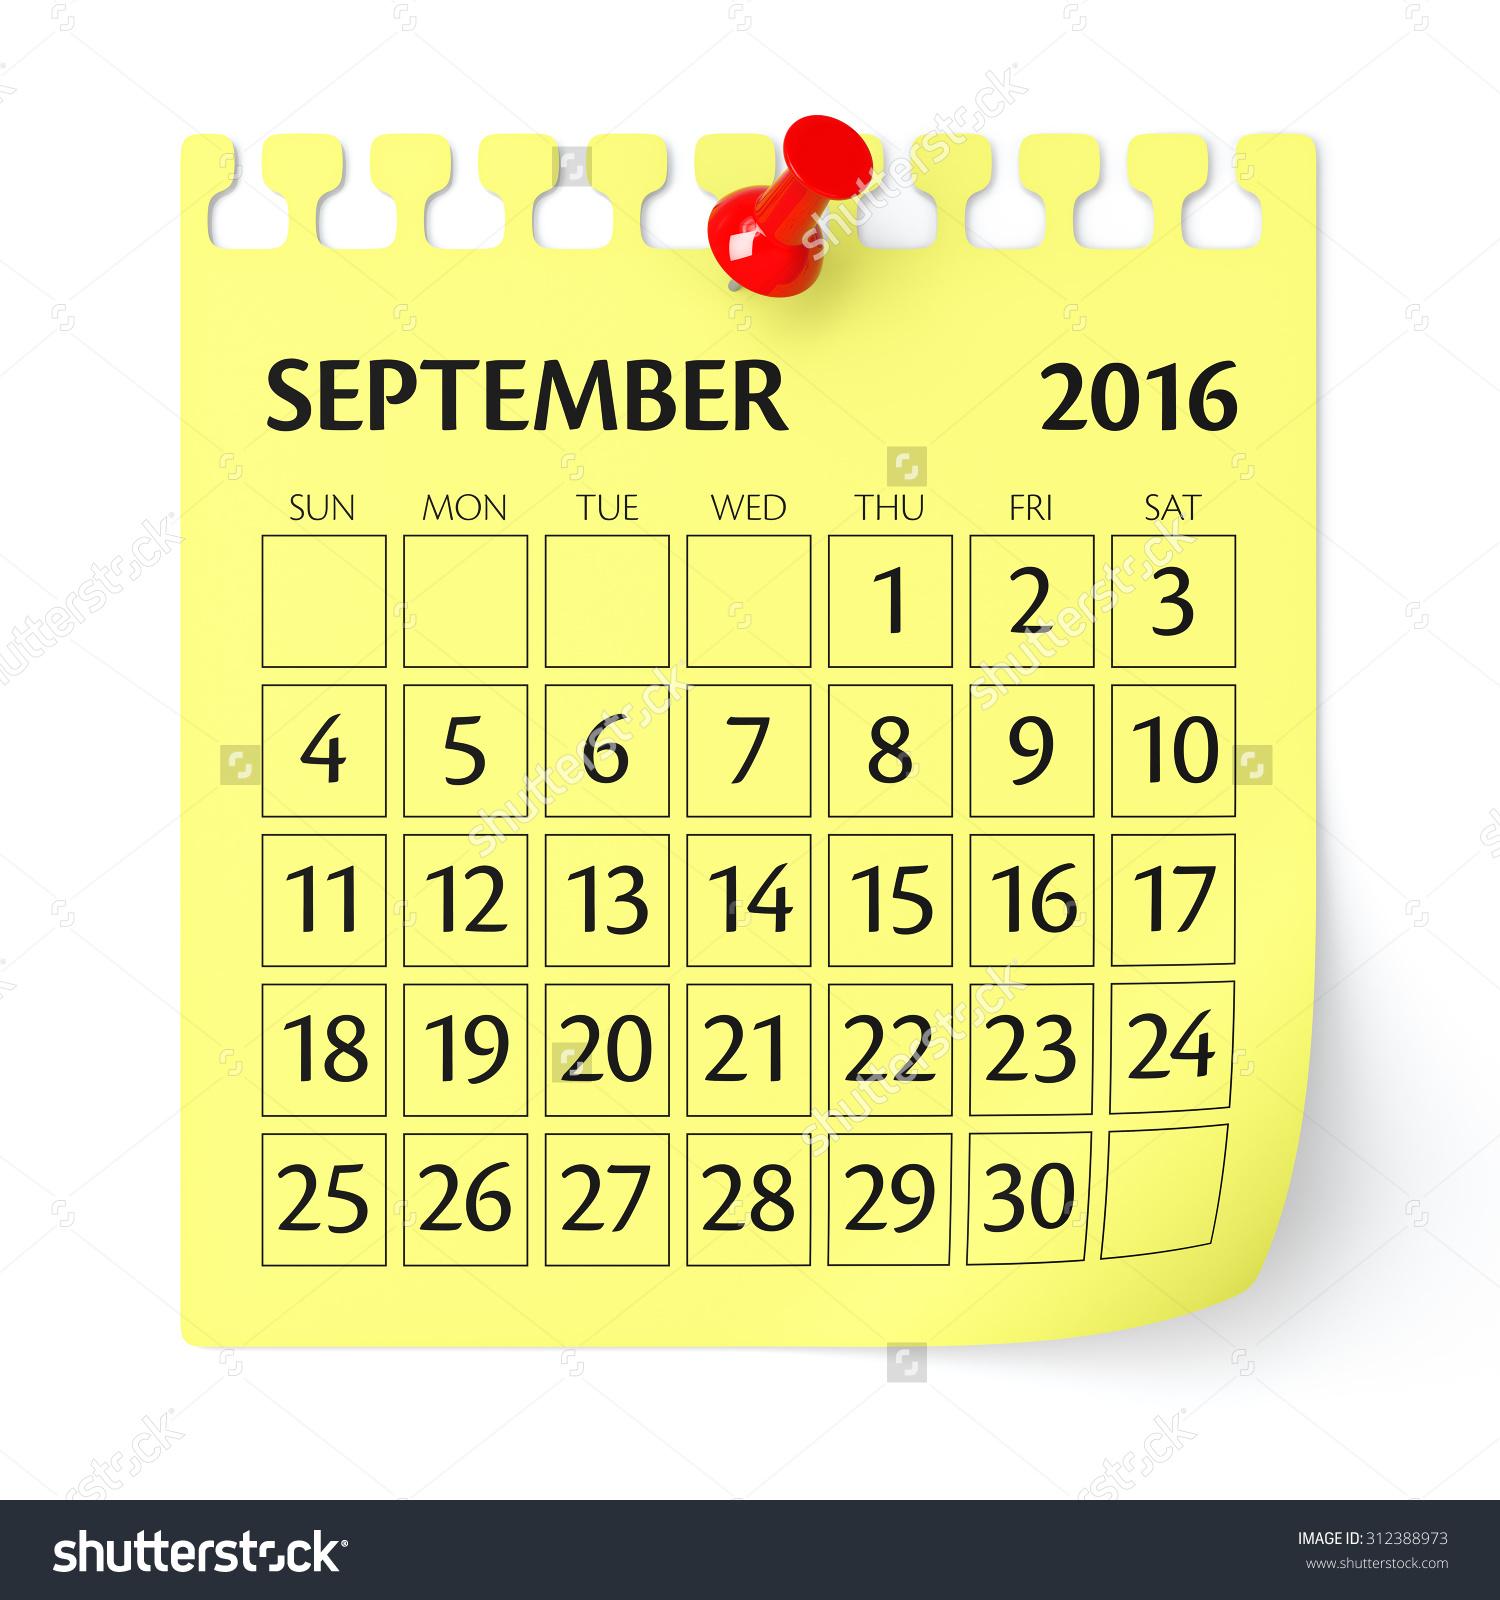 Disney clipart september calendar 2016 clipart free download September background calendar clipart - ClipartFox clipart free download